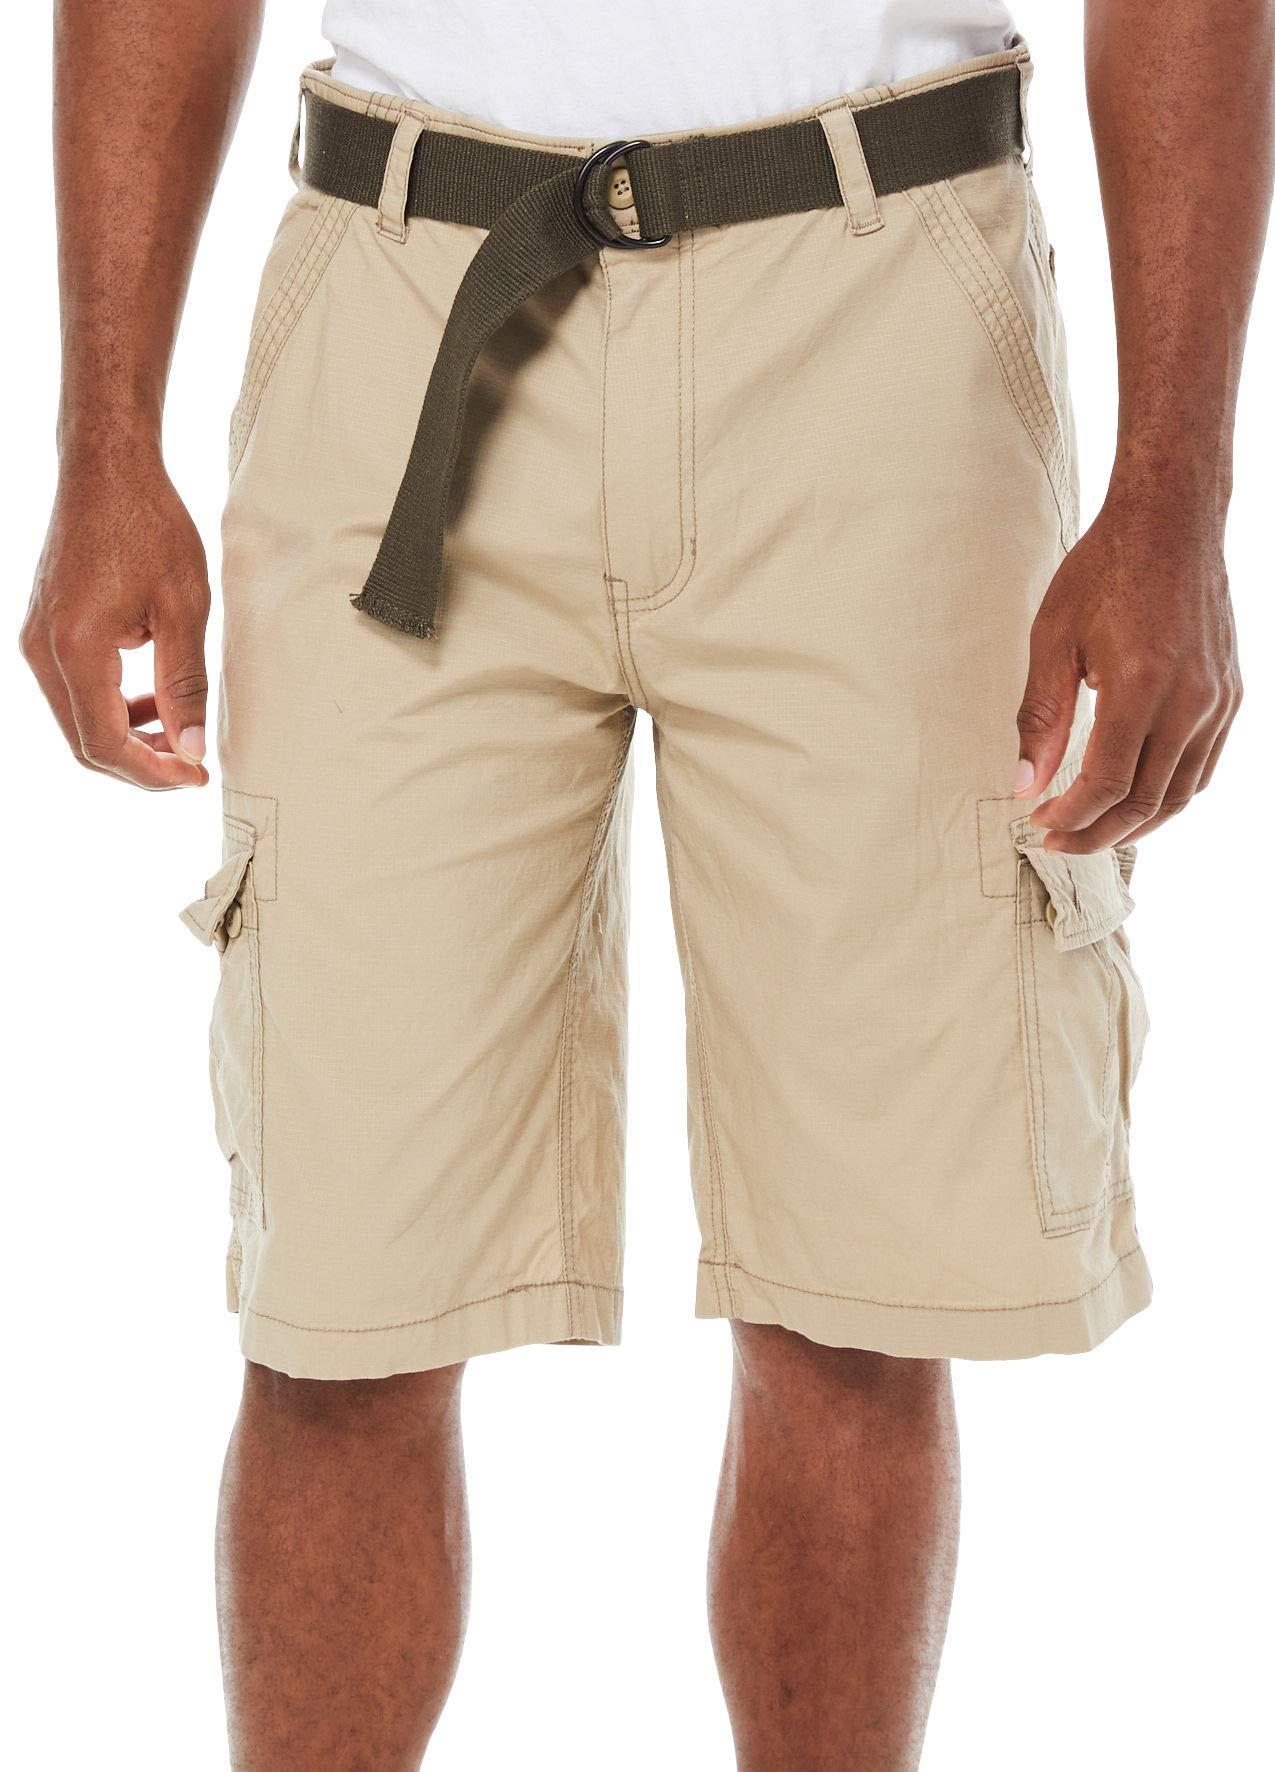 Wearfirst Mens Freeband Stretch Ripstop Cargo Shorts 34W Chinchilla Beige